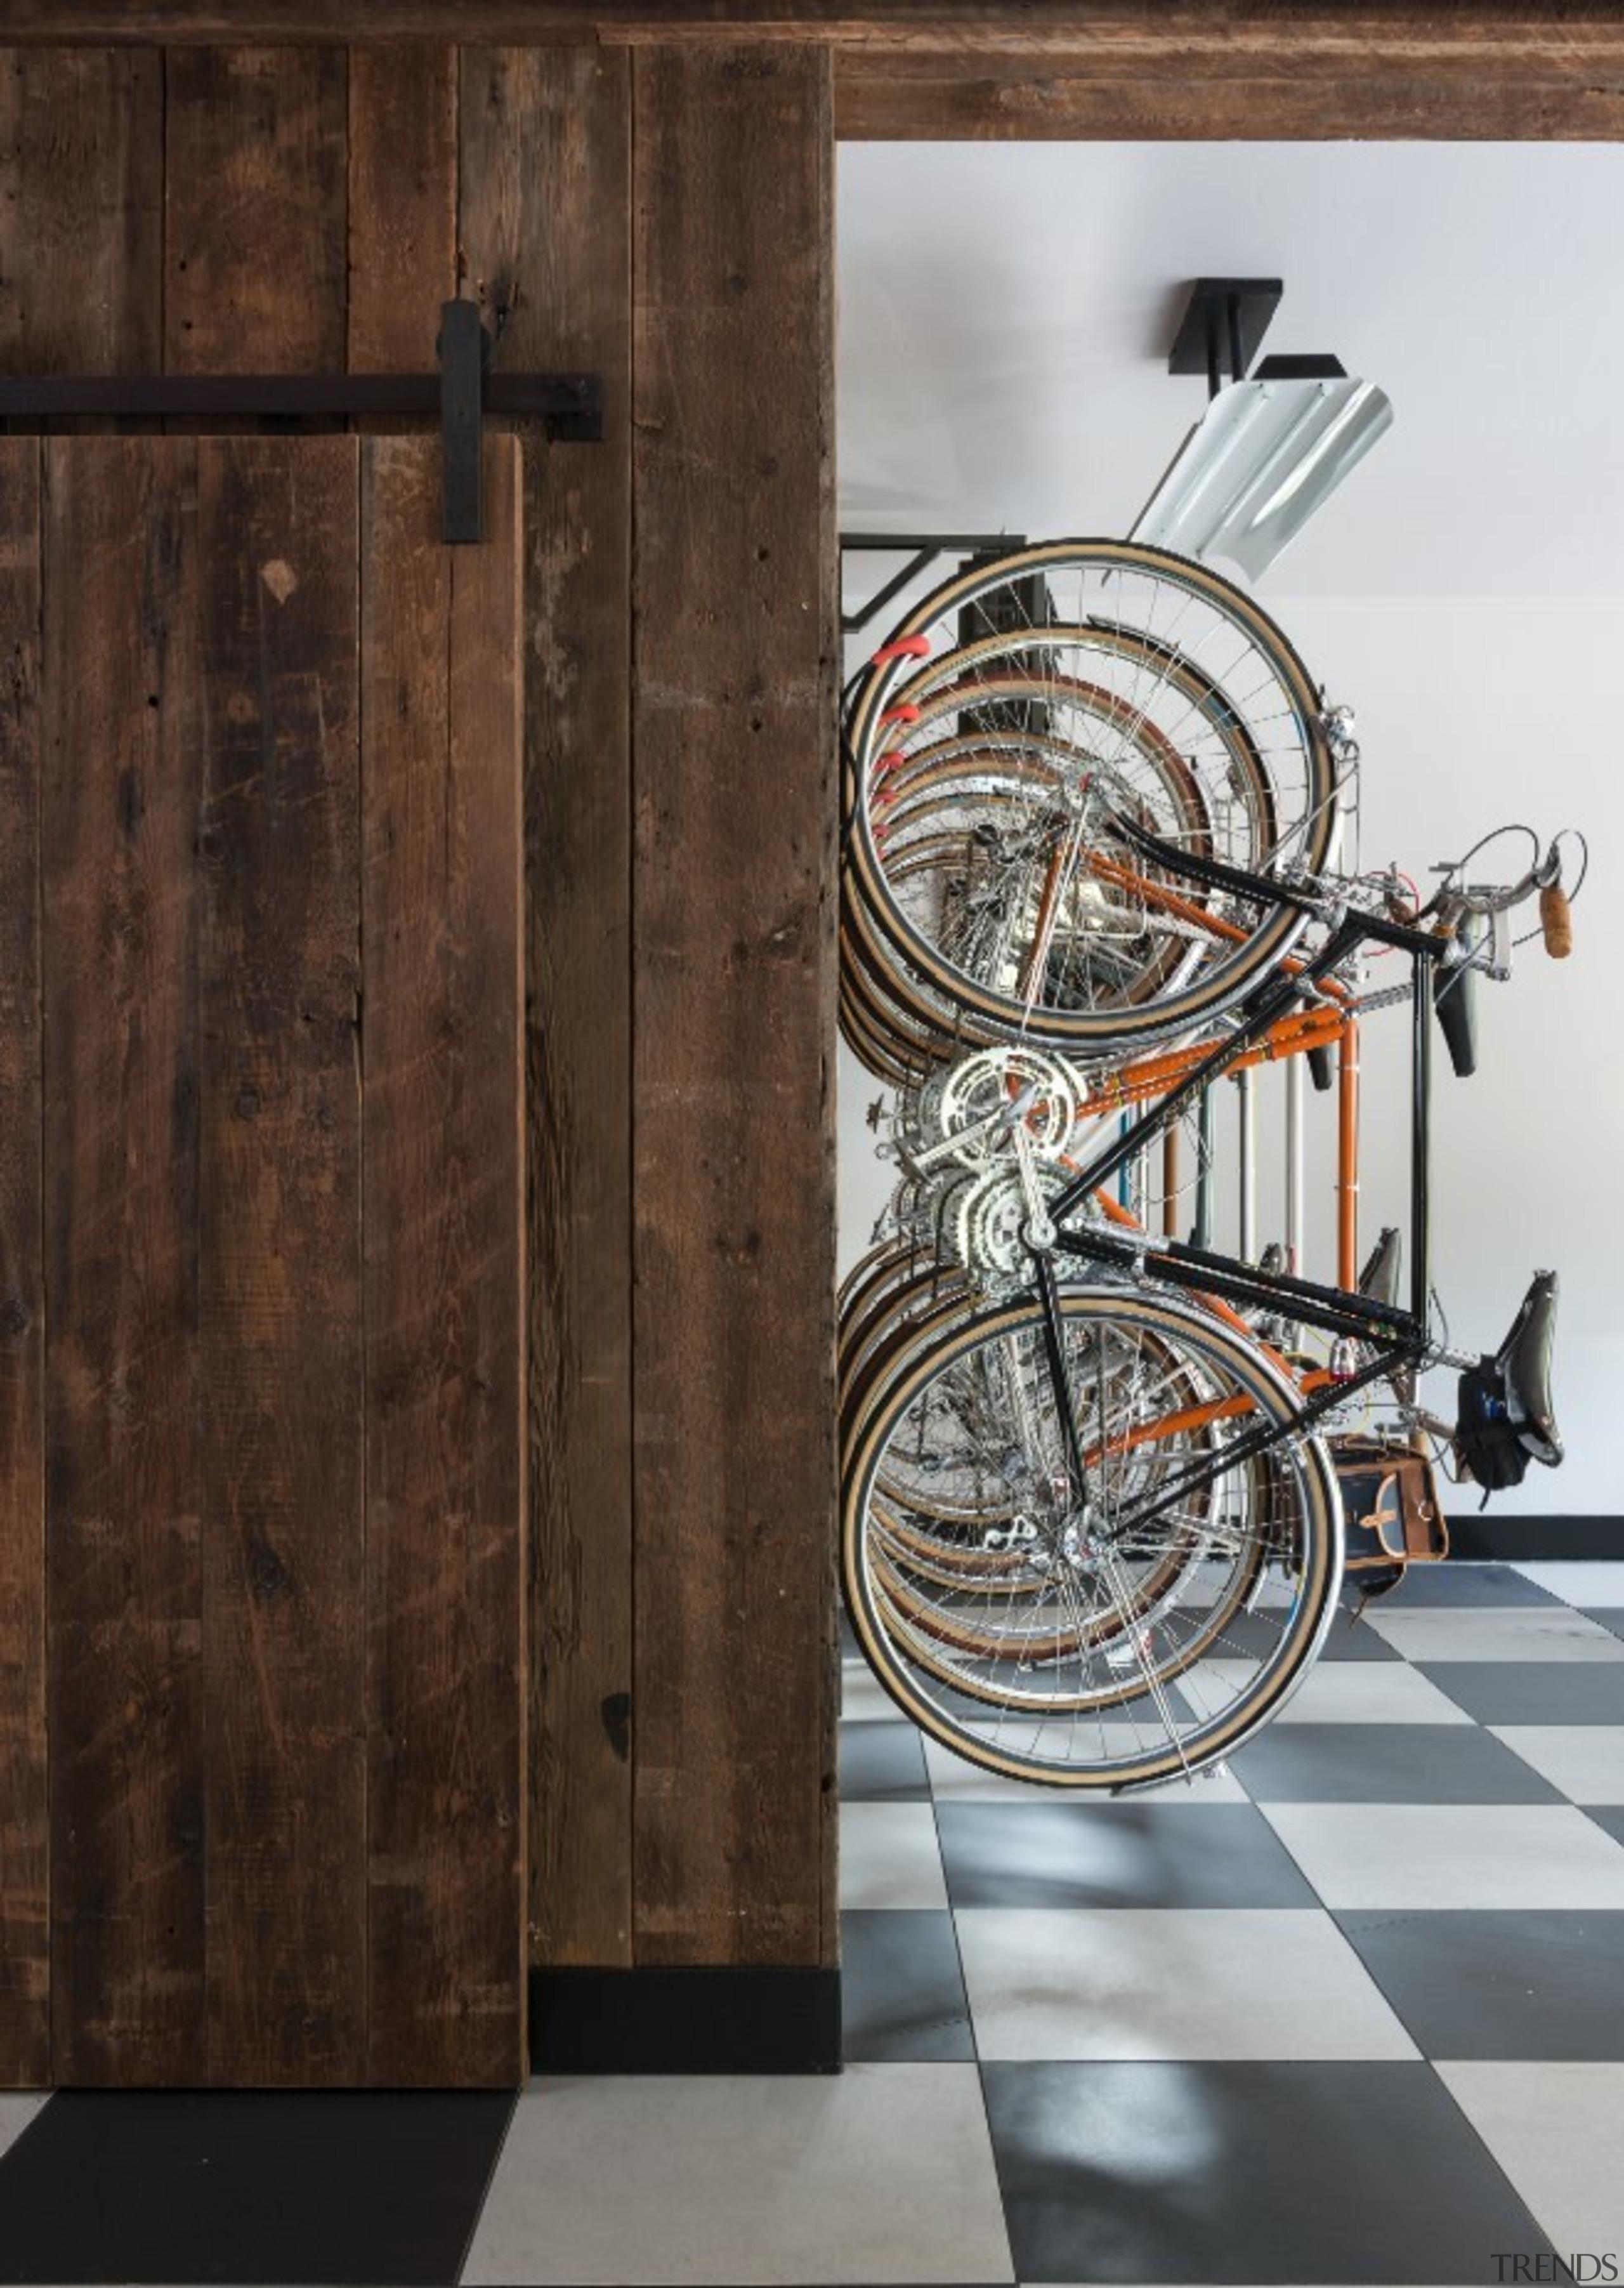 Bike storage runs along this wall above a wall, brown